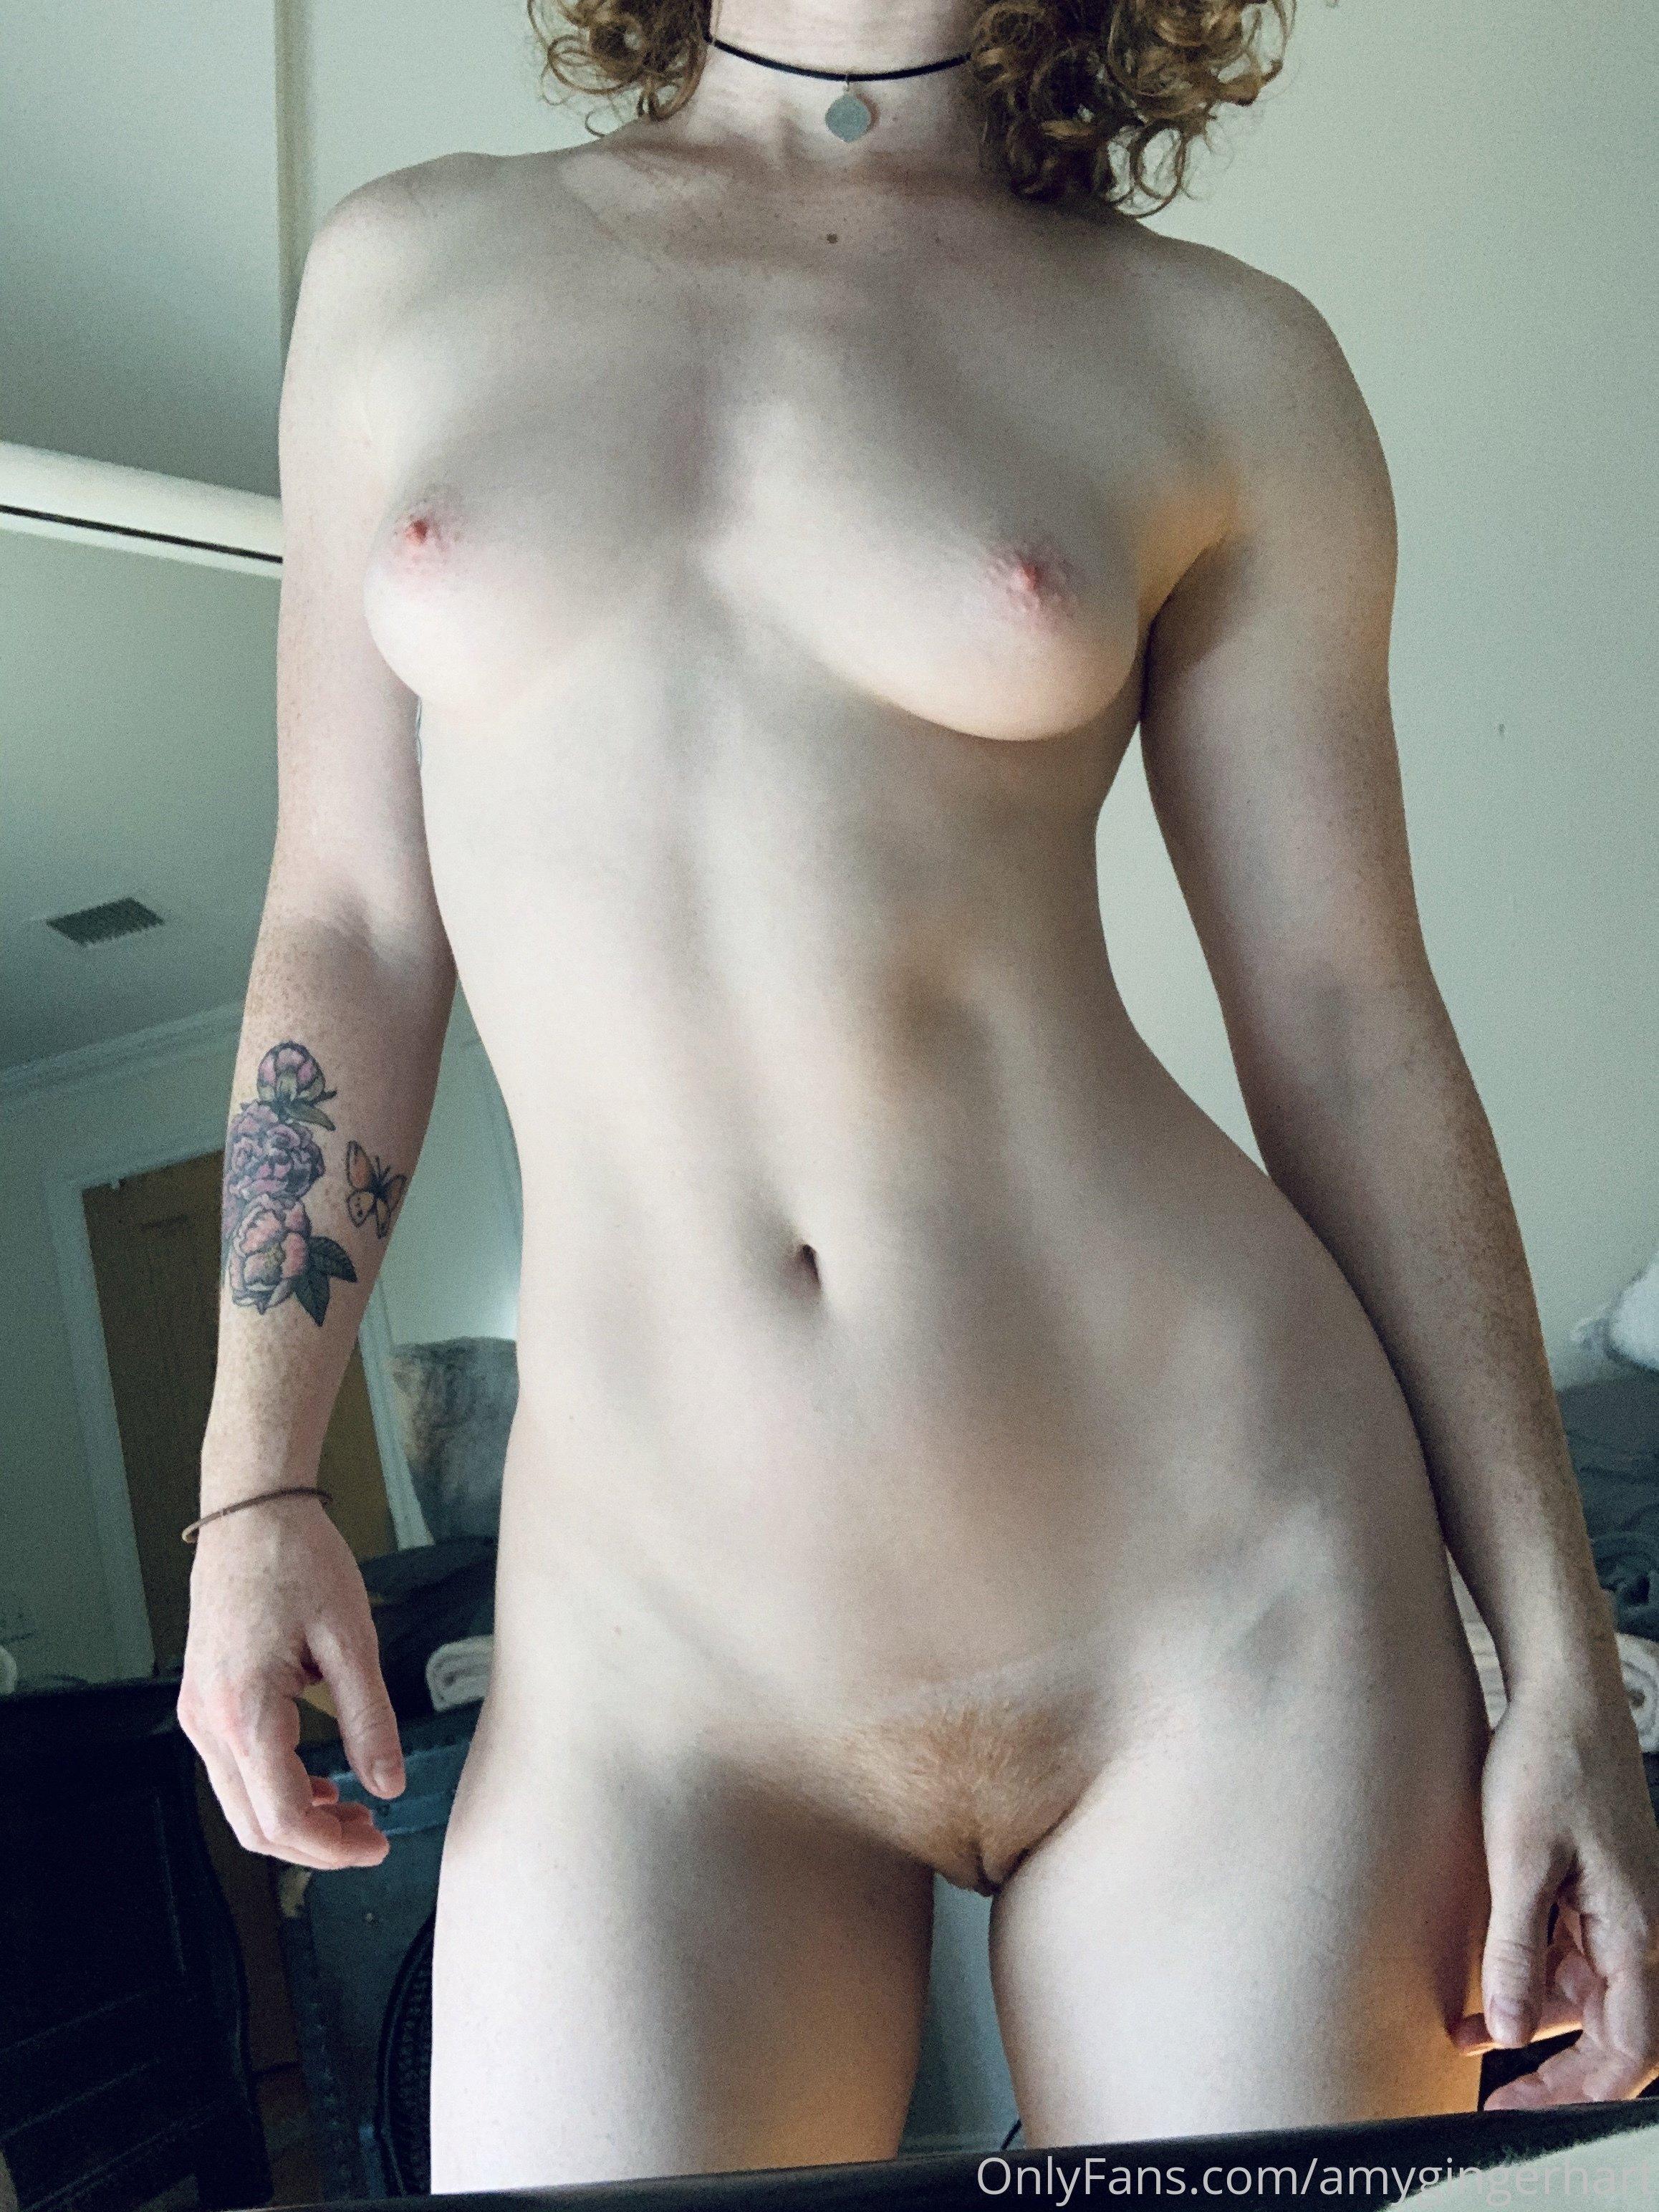 Amy Hart, Amygingerhart, Onlyfans 0111